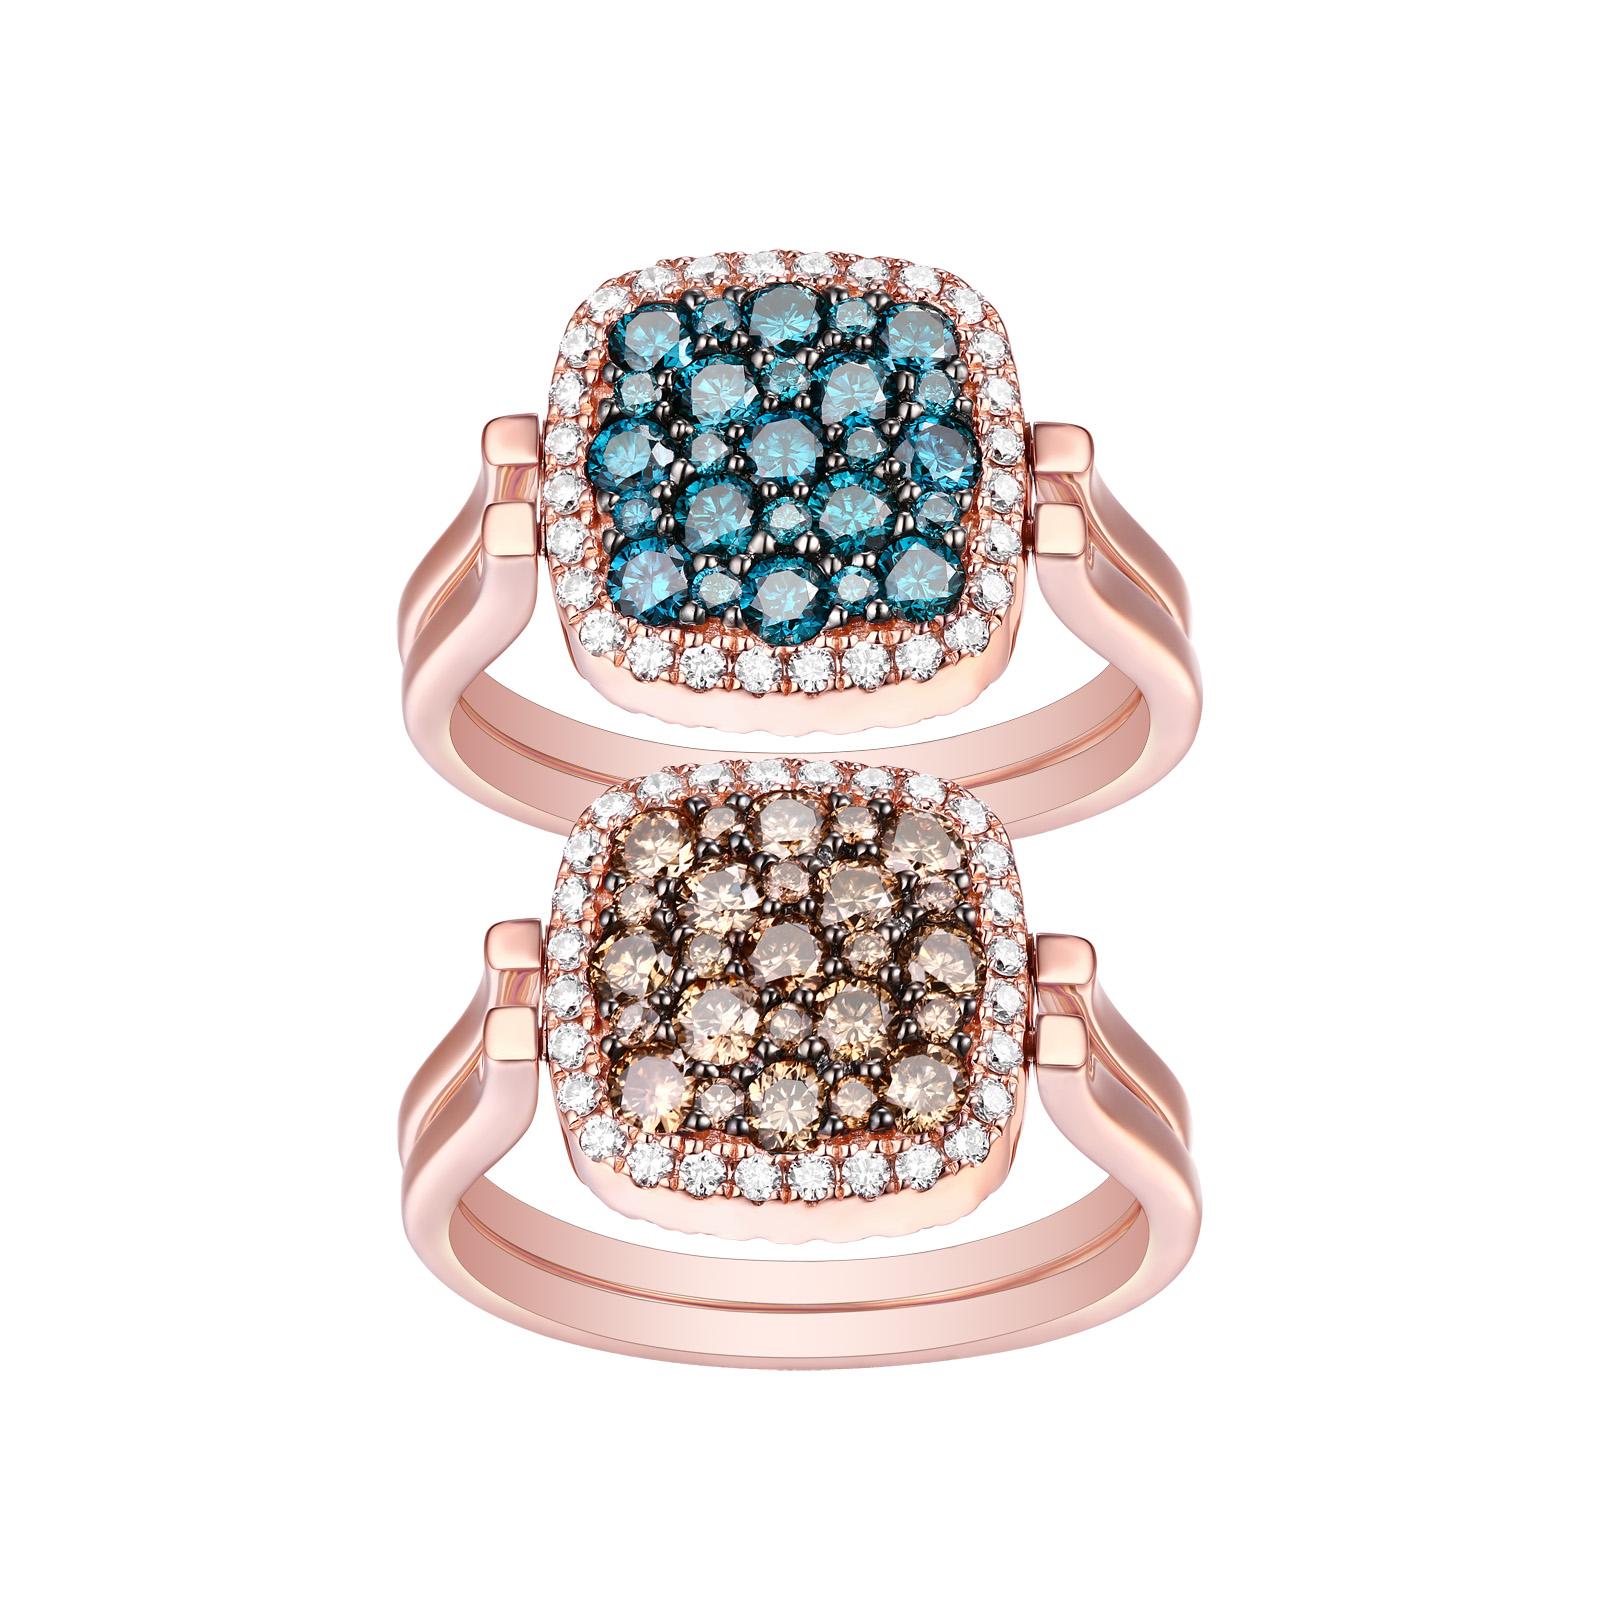 R26668DLW- 14K Rose Gold Diamond Ring, 1.76 TCW